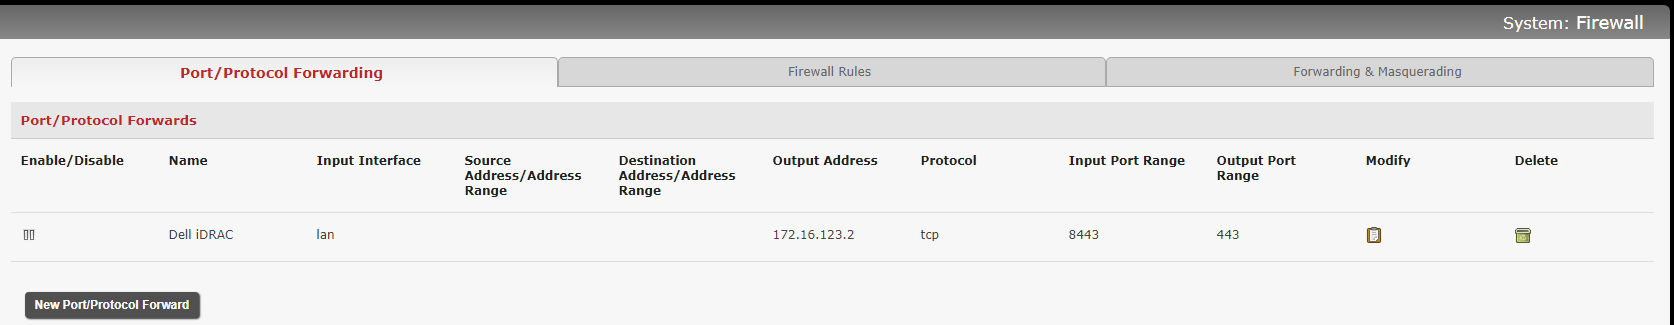 Firewall Script Template – Opengear Help Desk